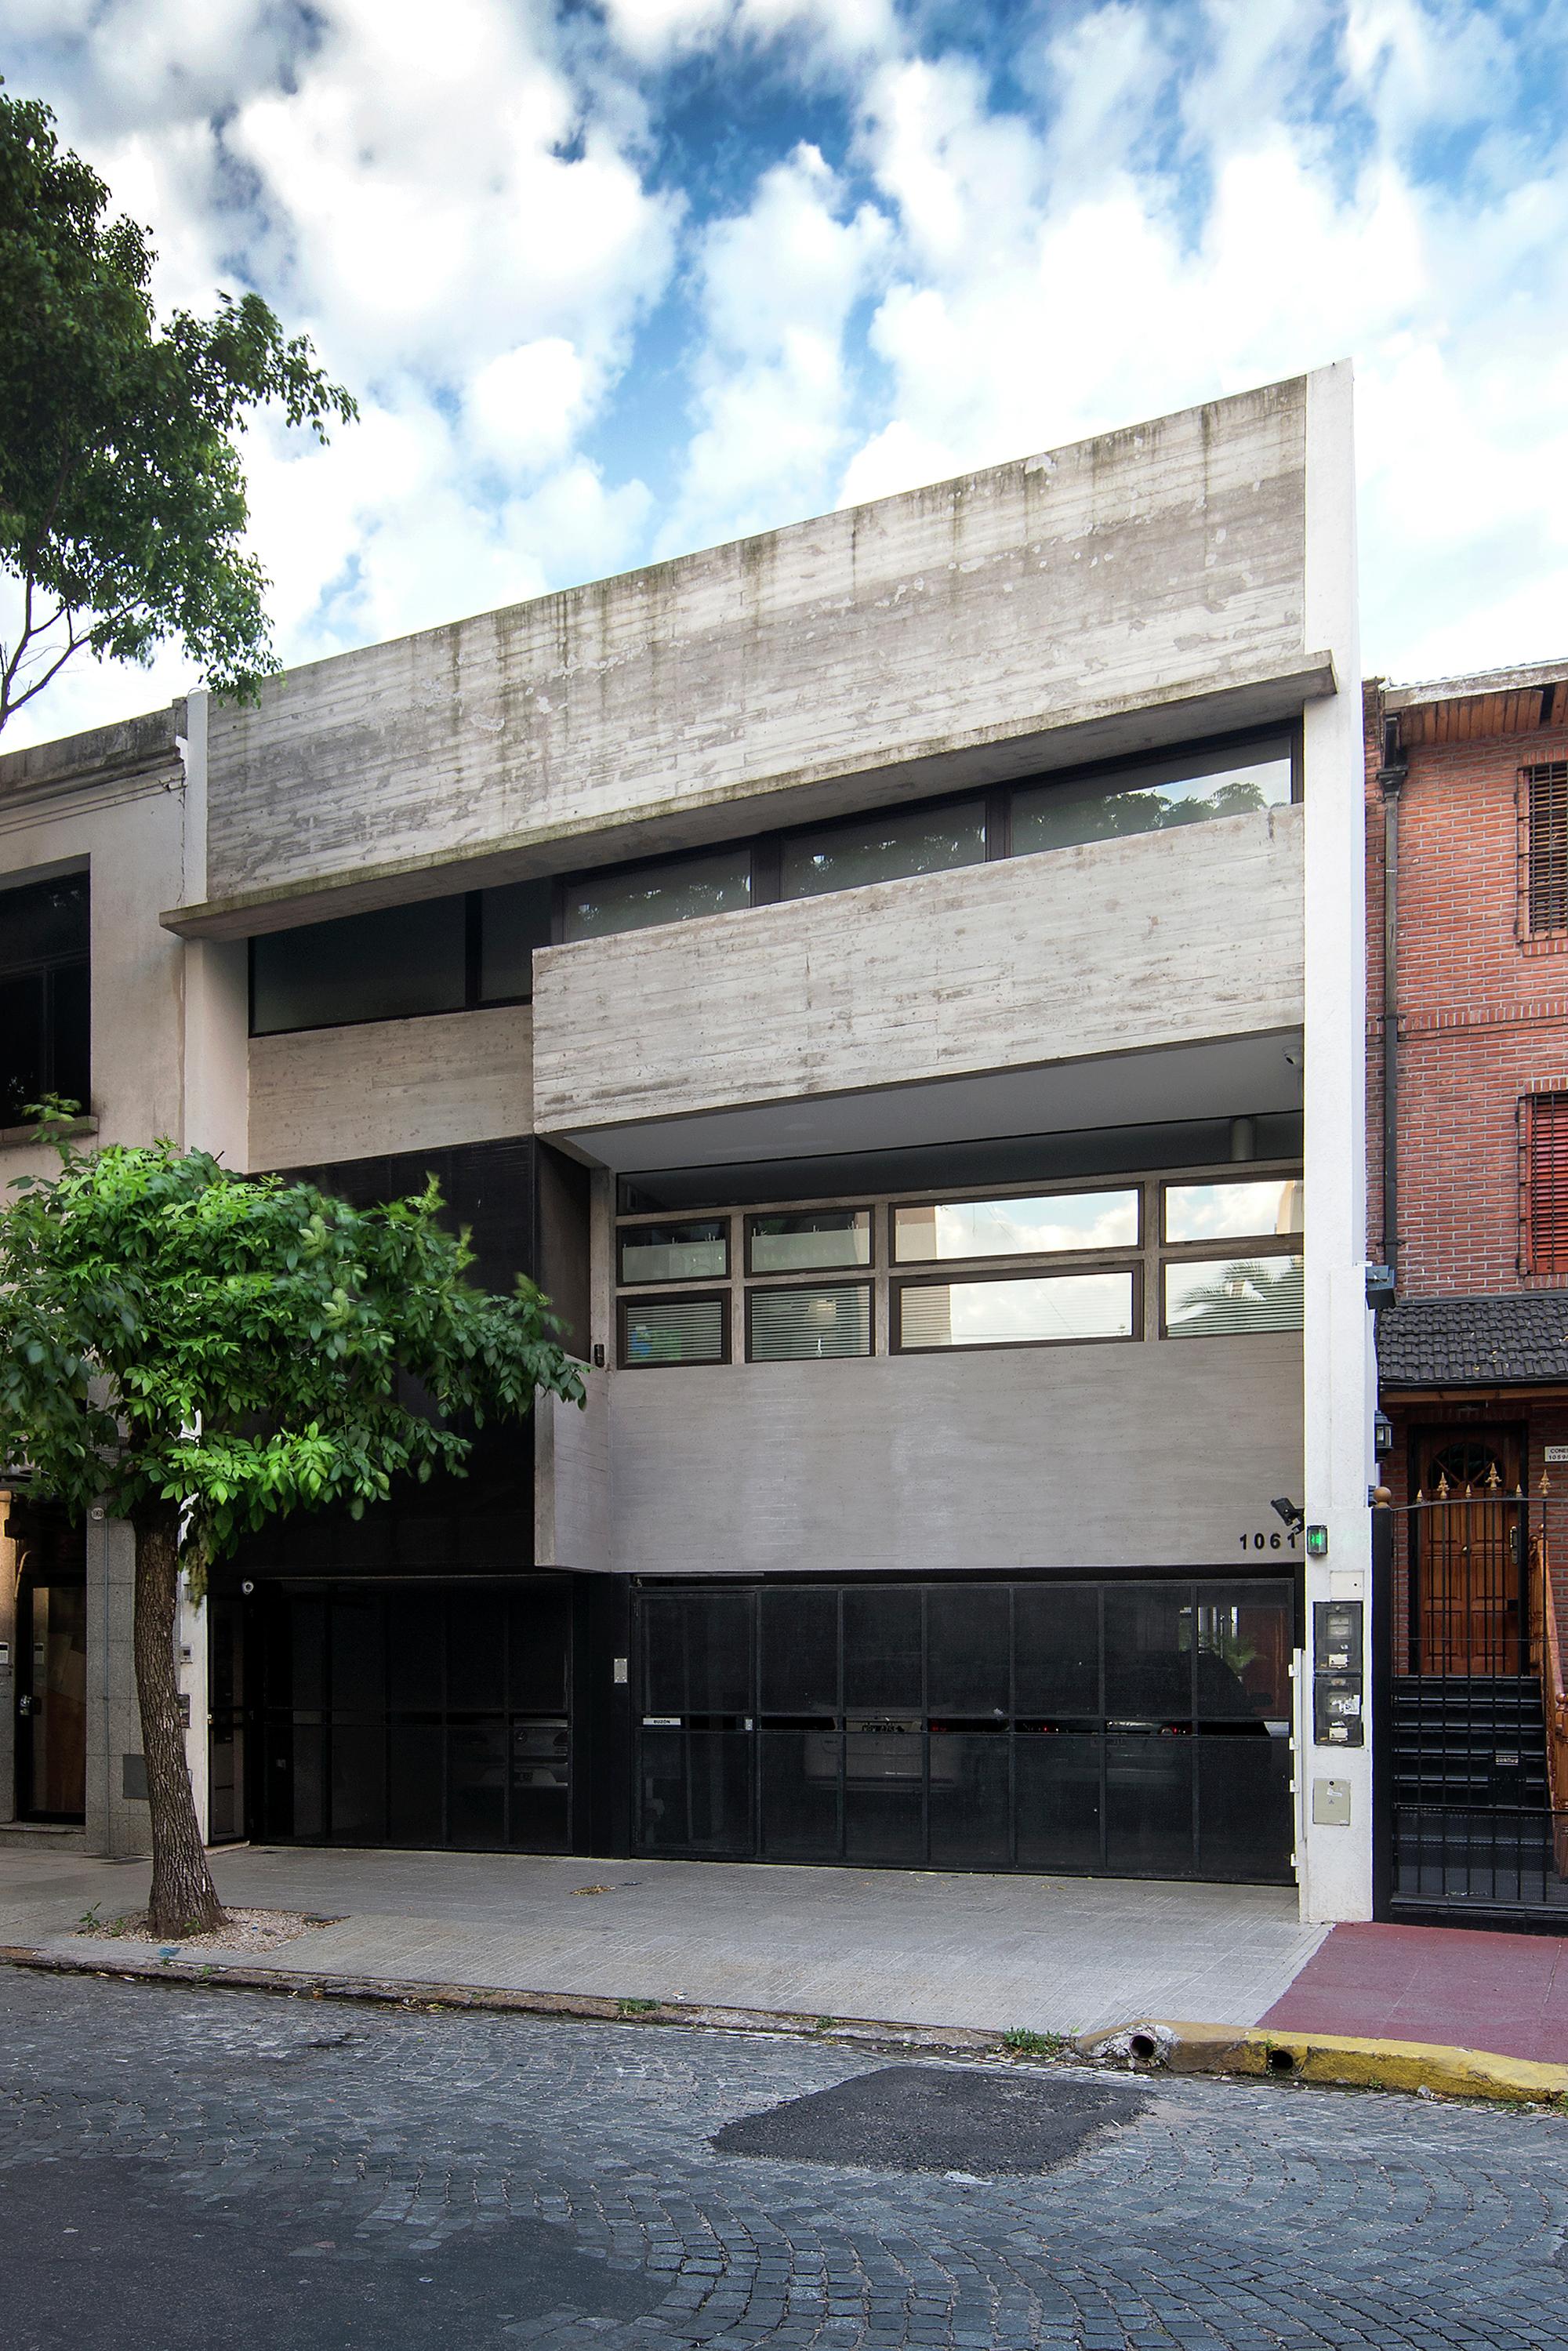 Galeria de 2 casas conesa bak arquitectos 15 for Arquitectos para casas